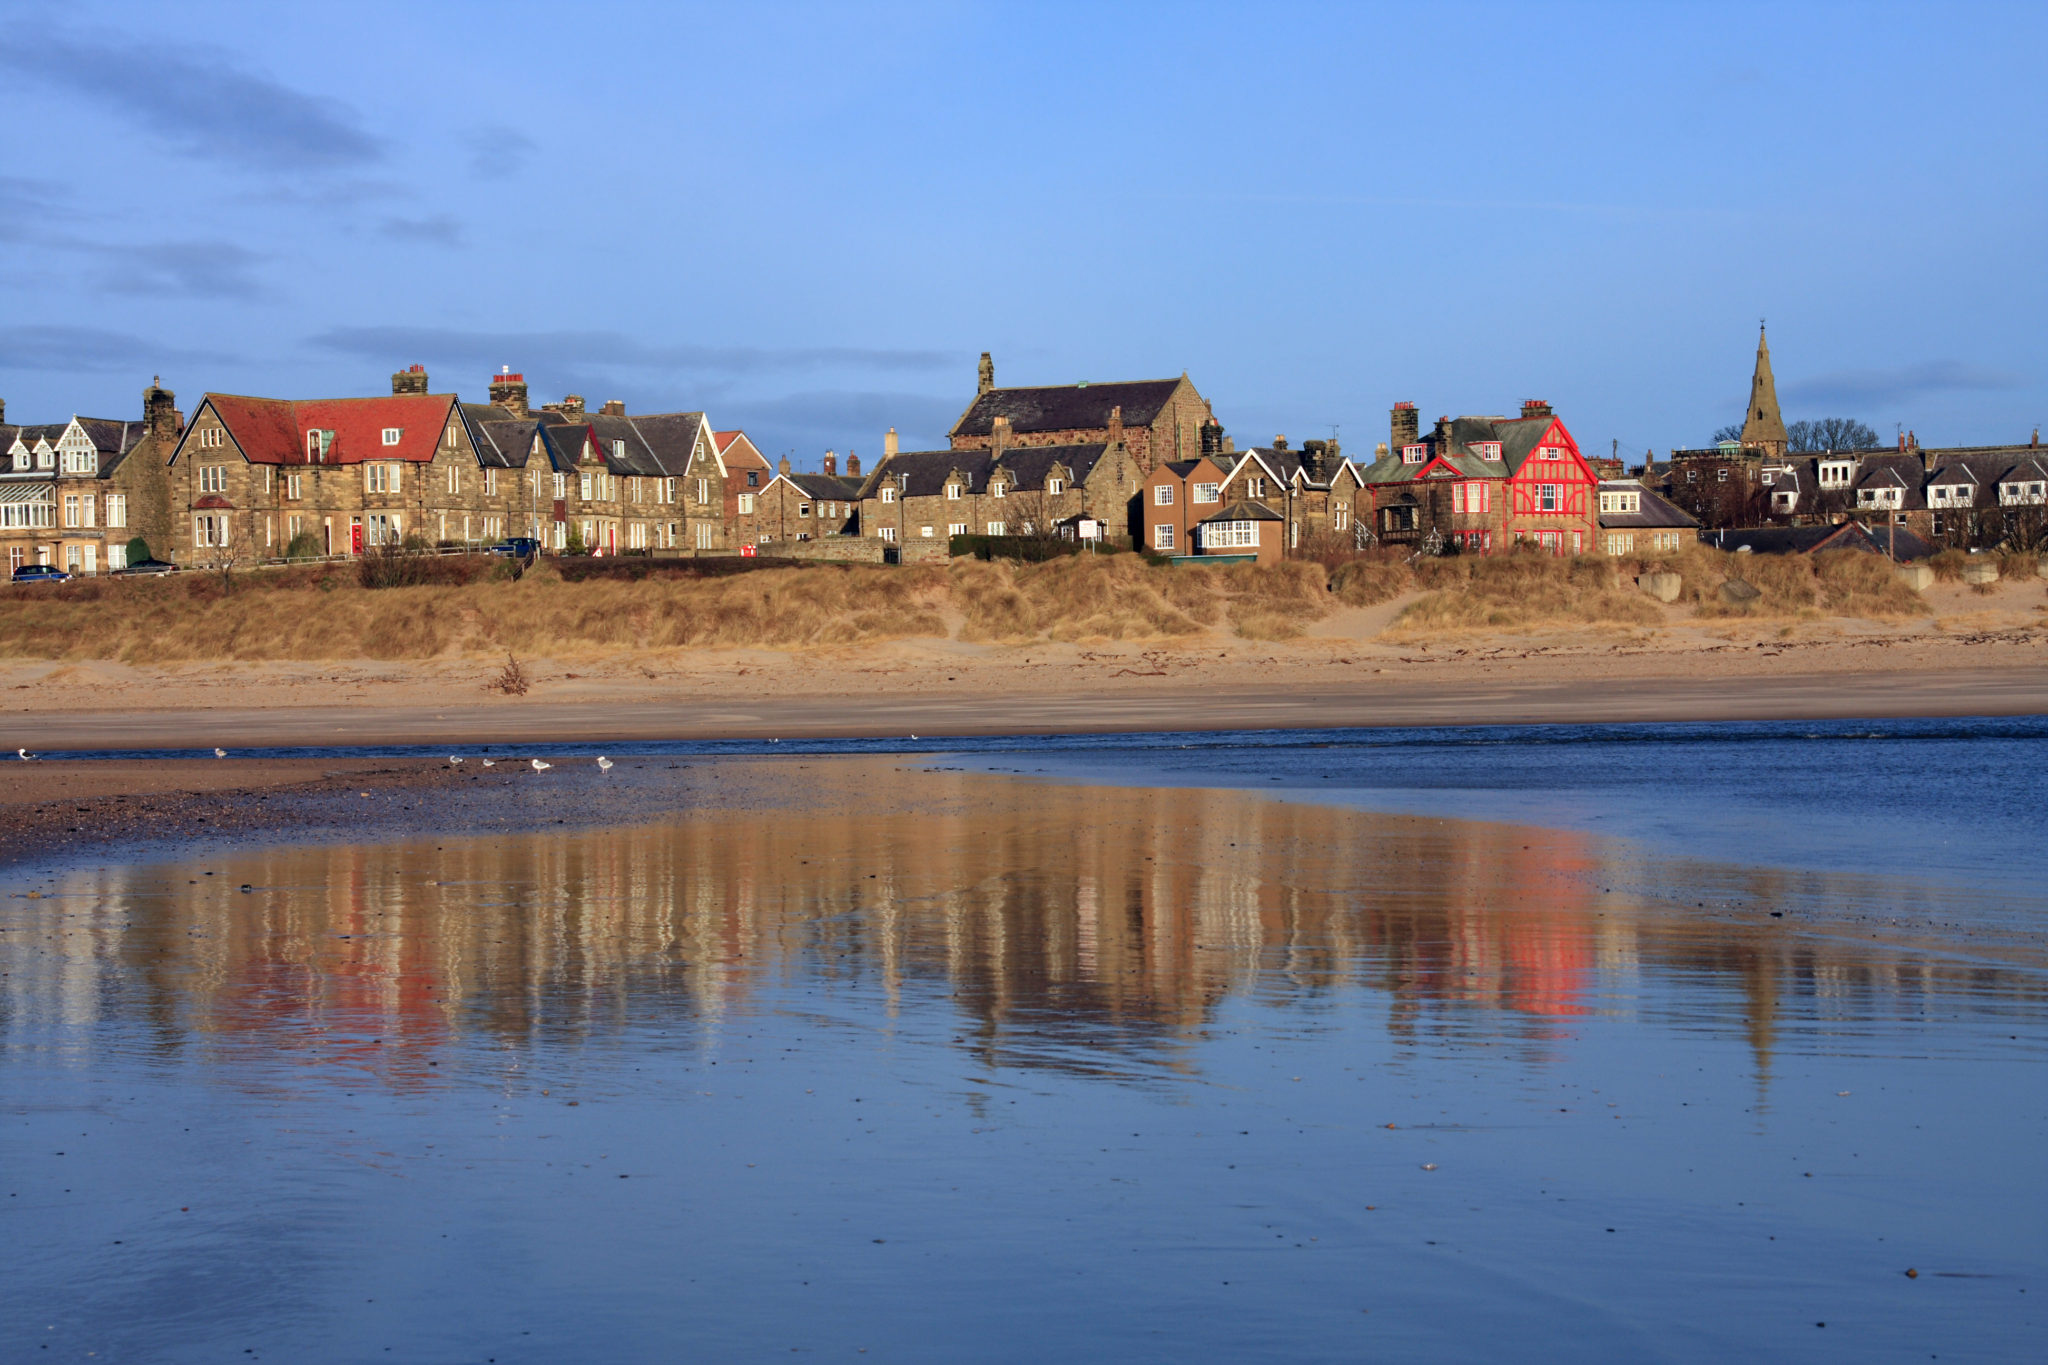 Alnmouth, Northumberland, Stablewood Coastal Cottages